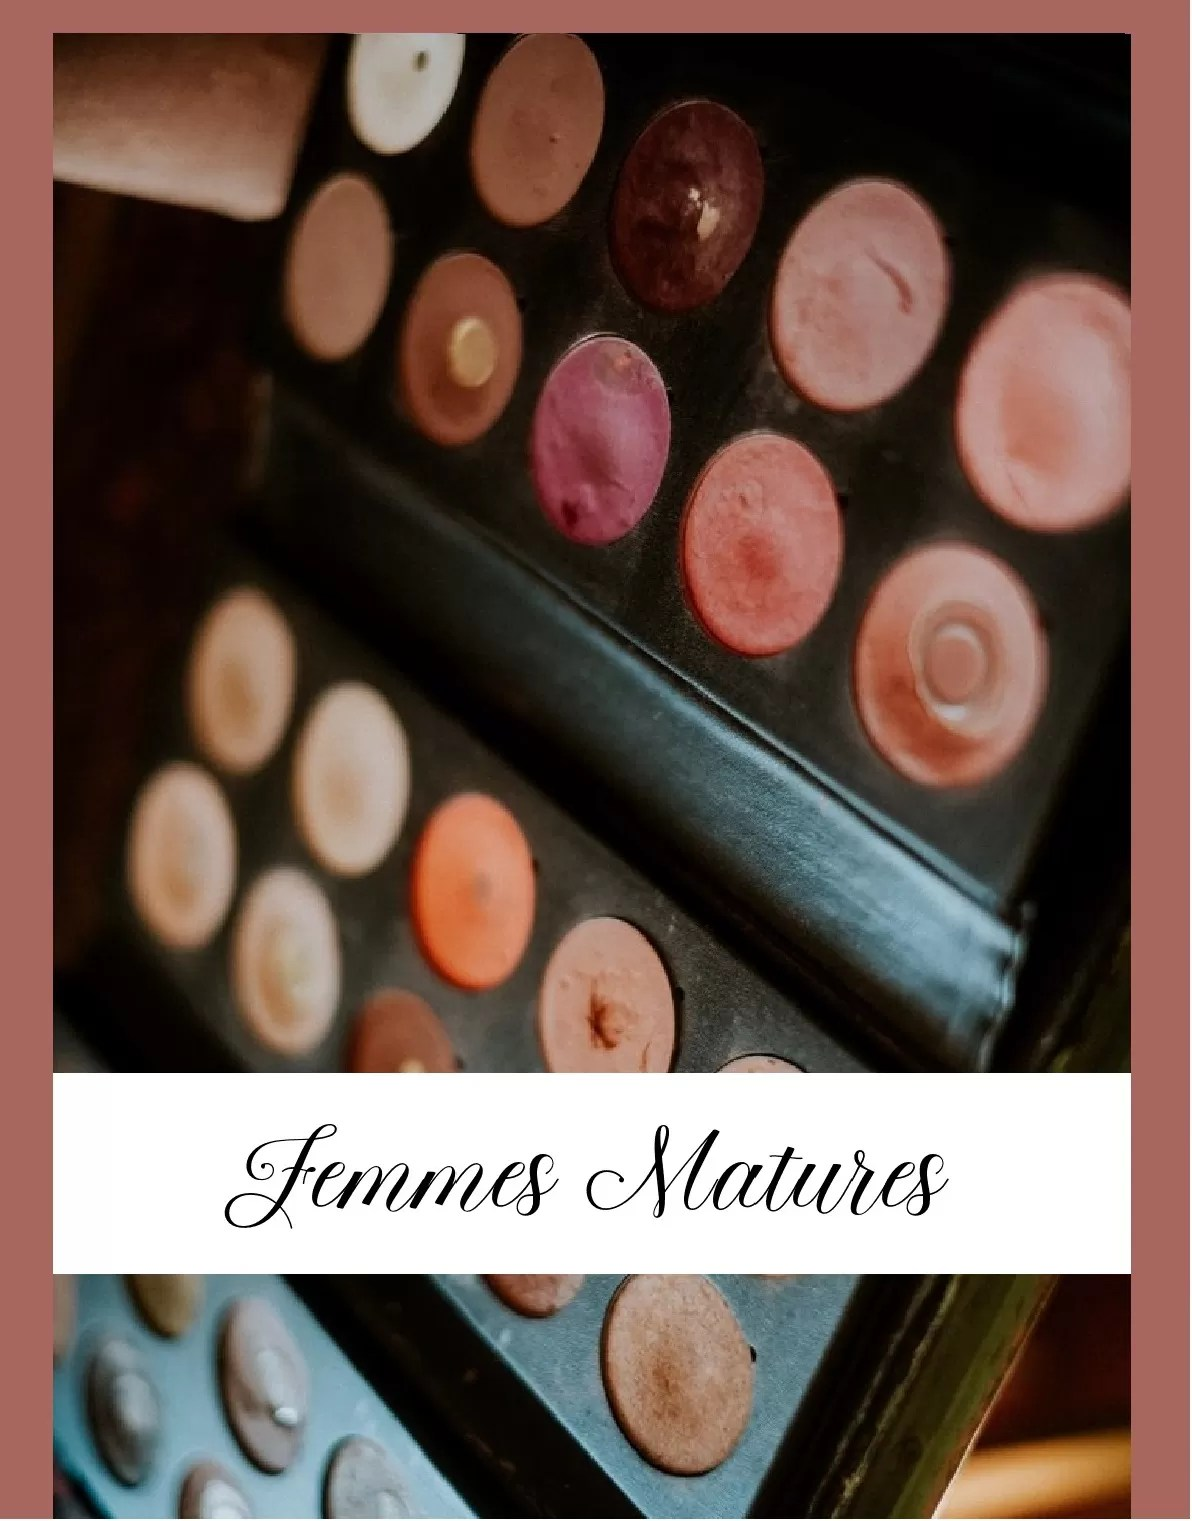 formation maquillage femmes matures Normandie Cherbourg la Manche